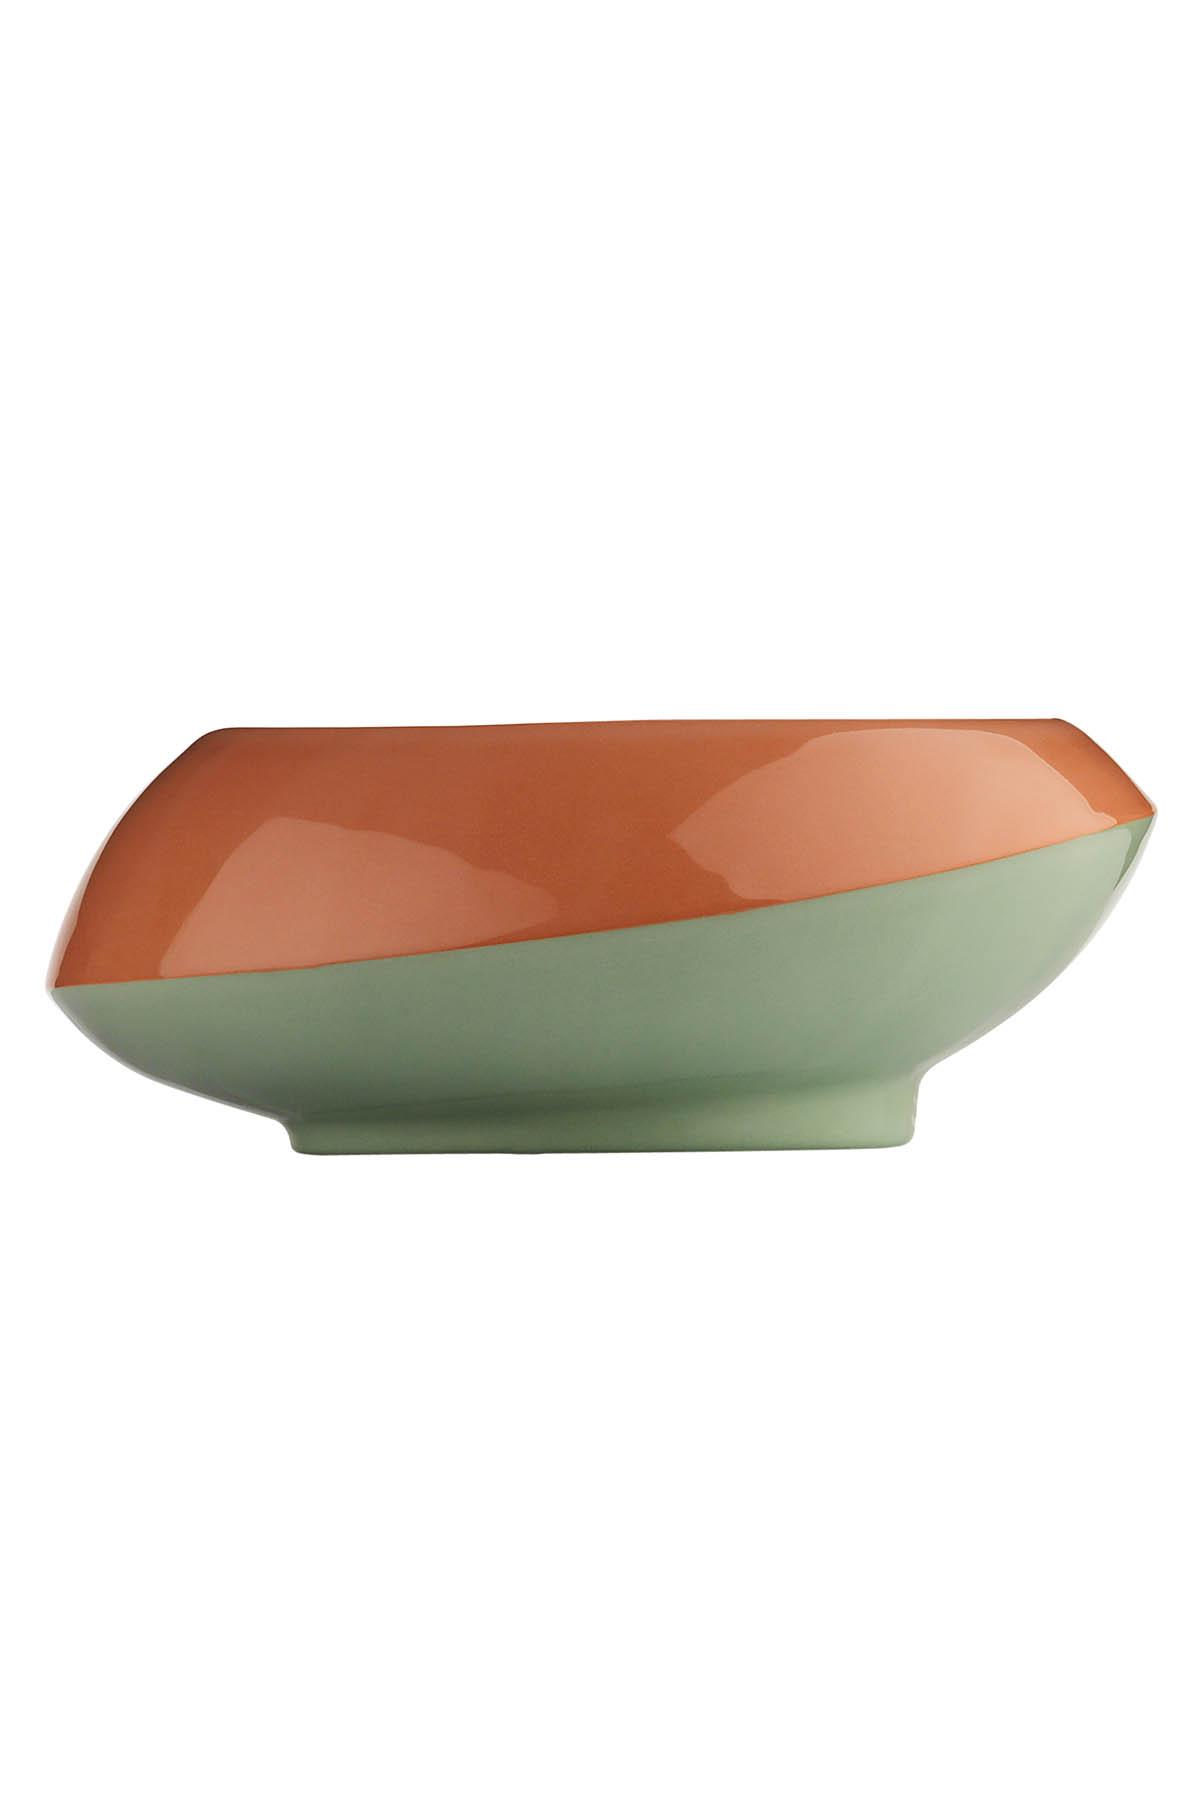 Kütahya Porselen - Aura 23 cm Kase 3 Renkli Yeşil/Kırmızı/Siyah